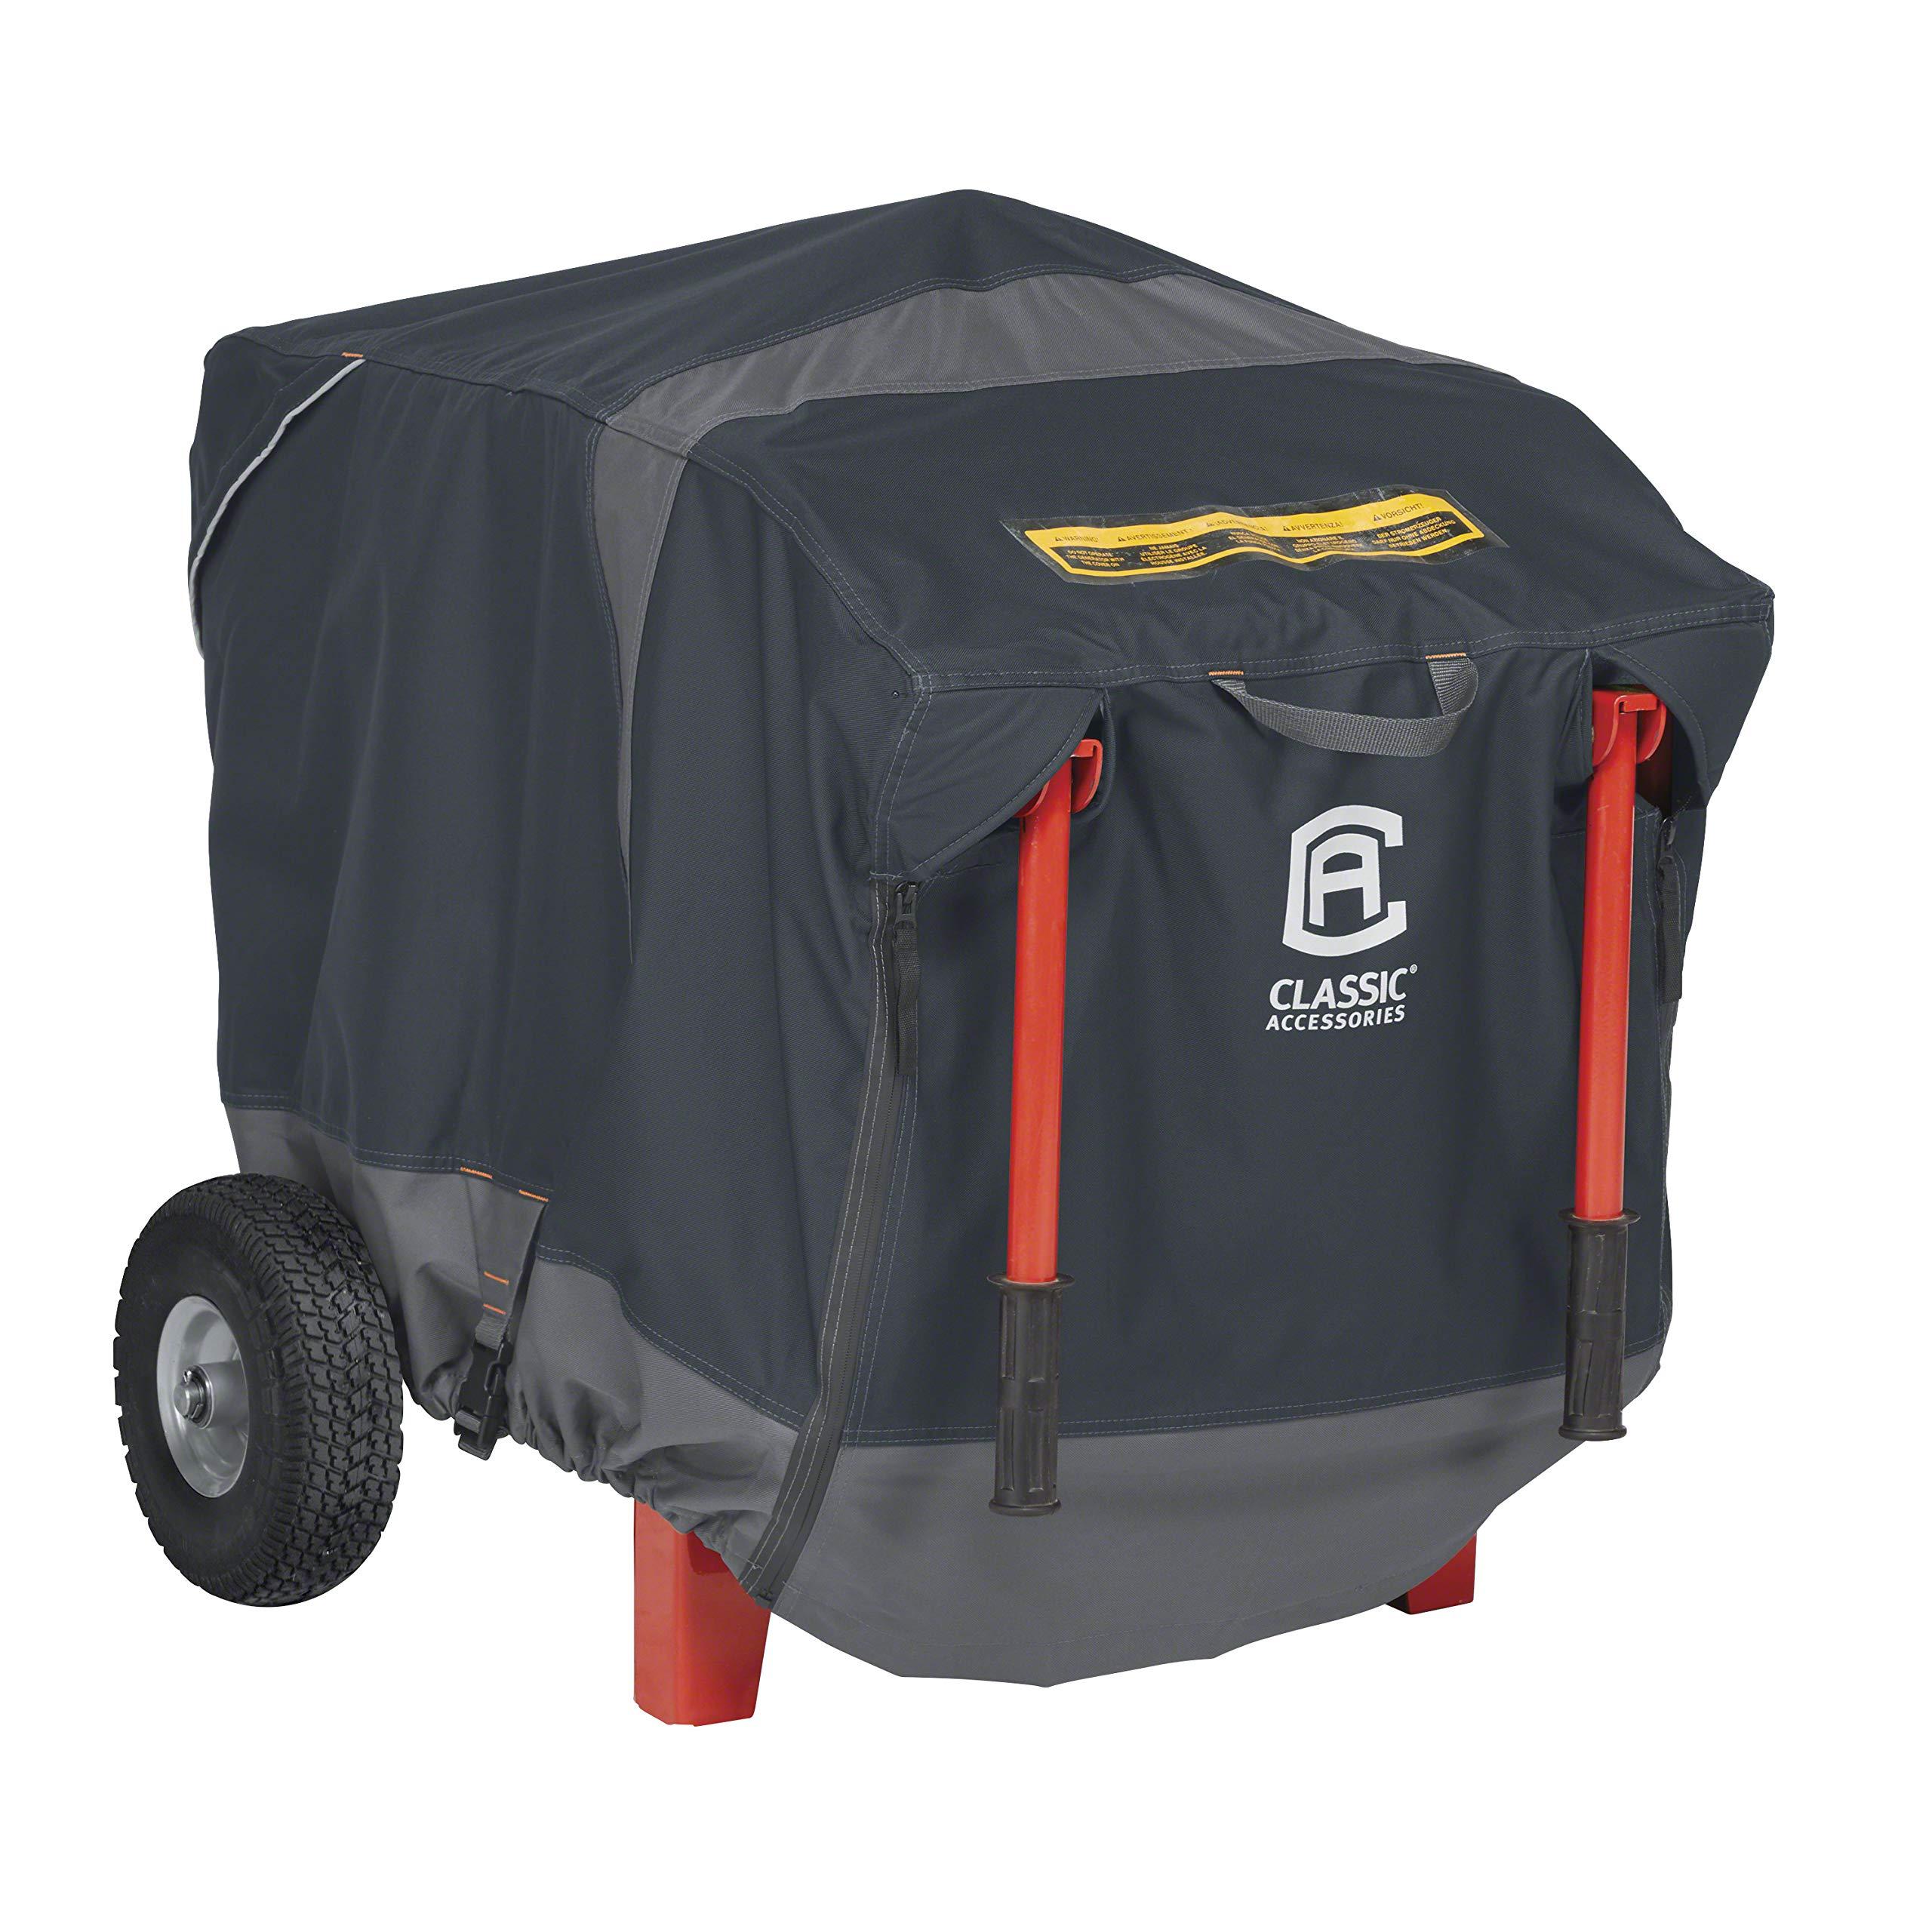 Classic Accessories StormPro RainProof Heavy Duty Generator Cover, X-Large